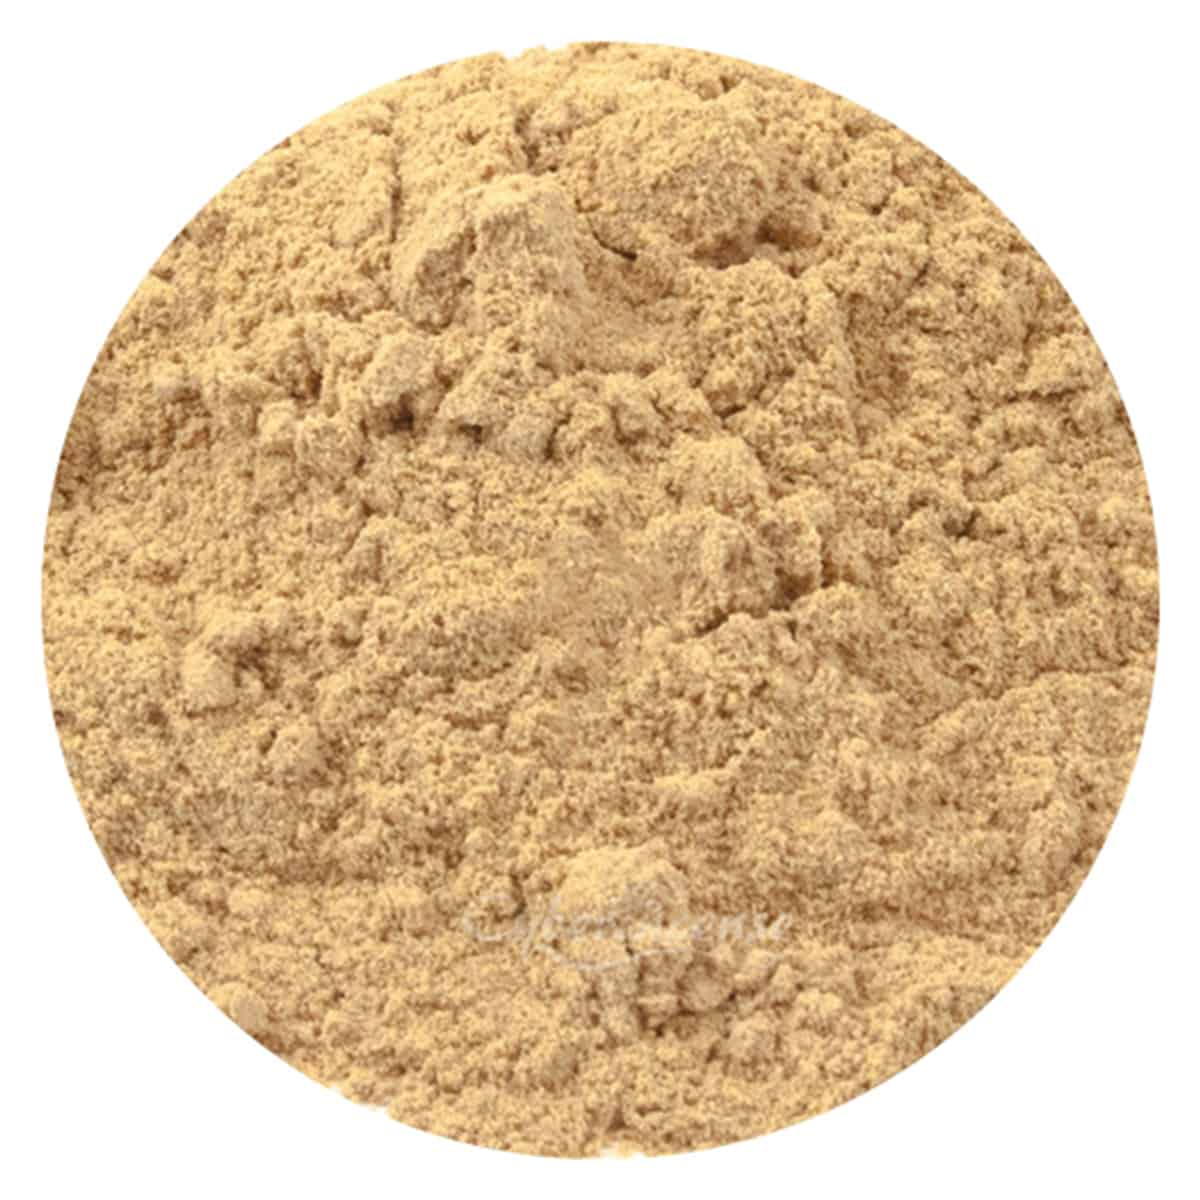 Buy IAG Foods Amla Powder (Gooseberry Powder) - 1 kg